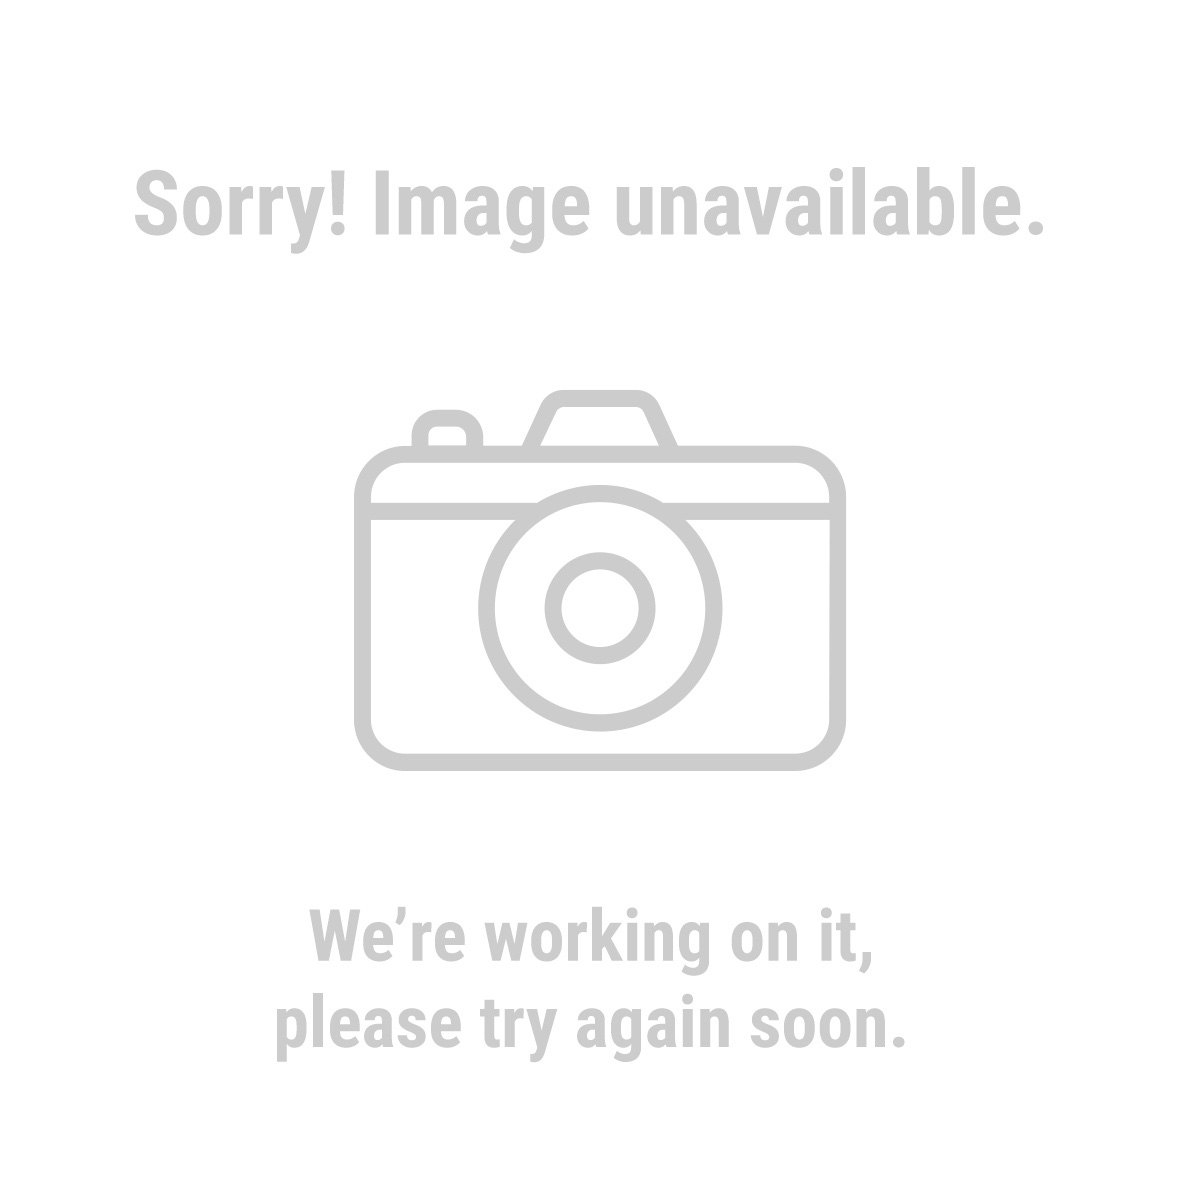 Western Safety Gloves 61236 Mechanic's Gloves with Spandex, Medium